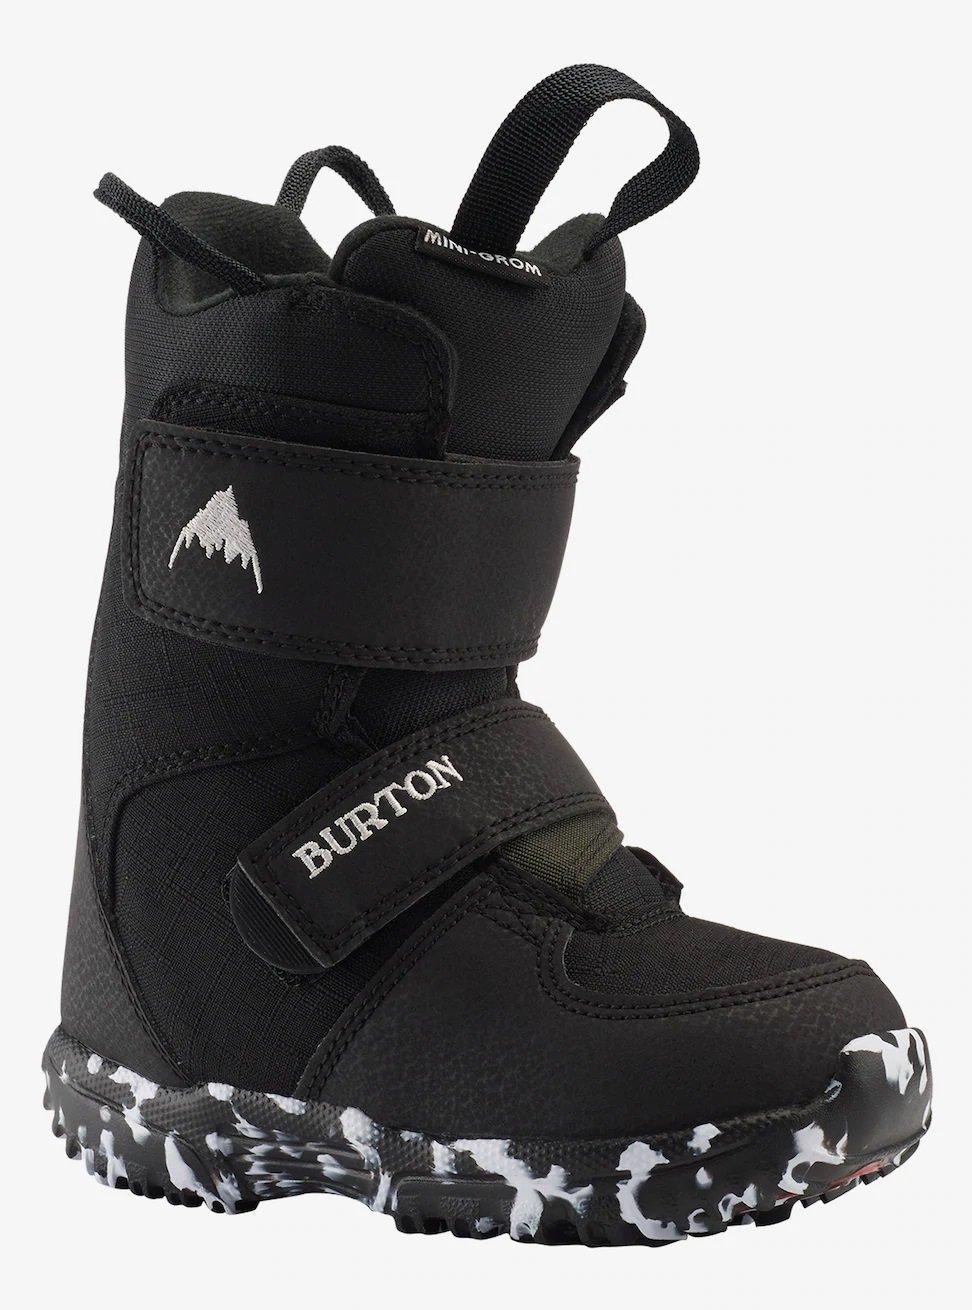 Burton Mini Grom Boot Black 2021